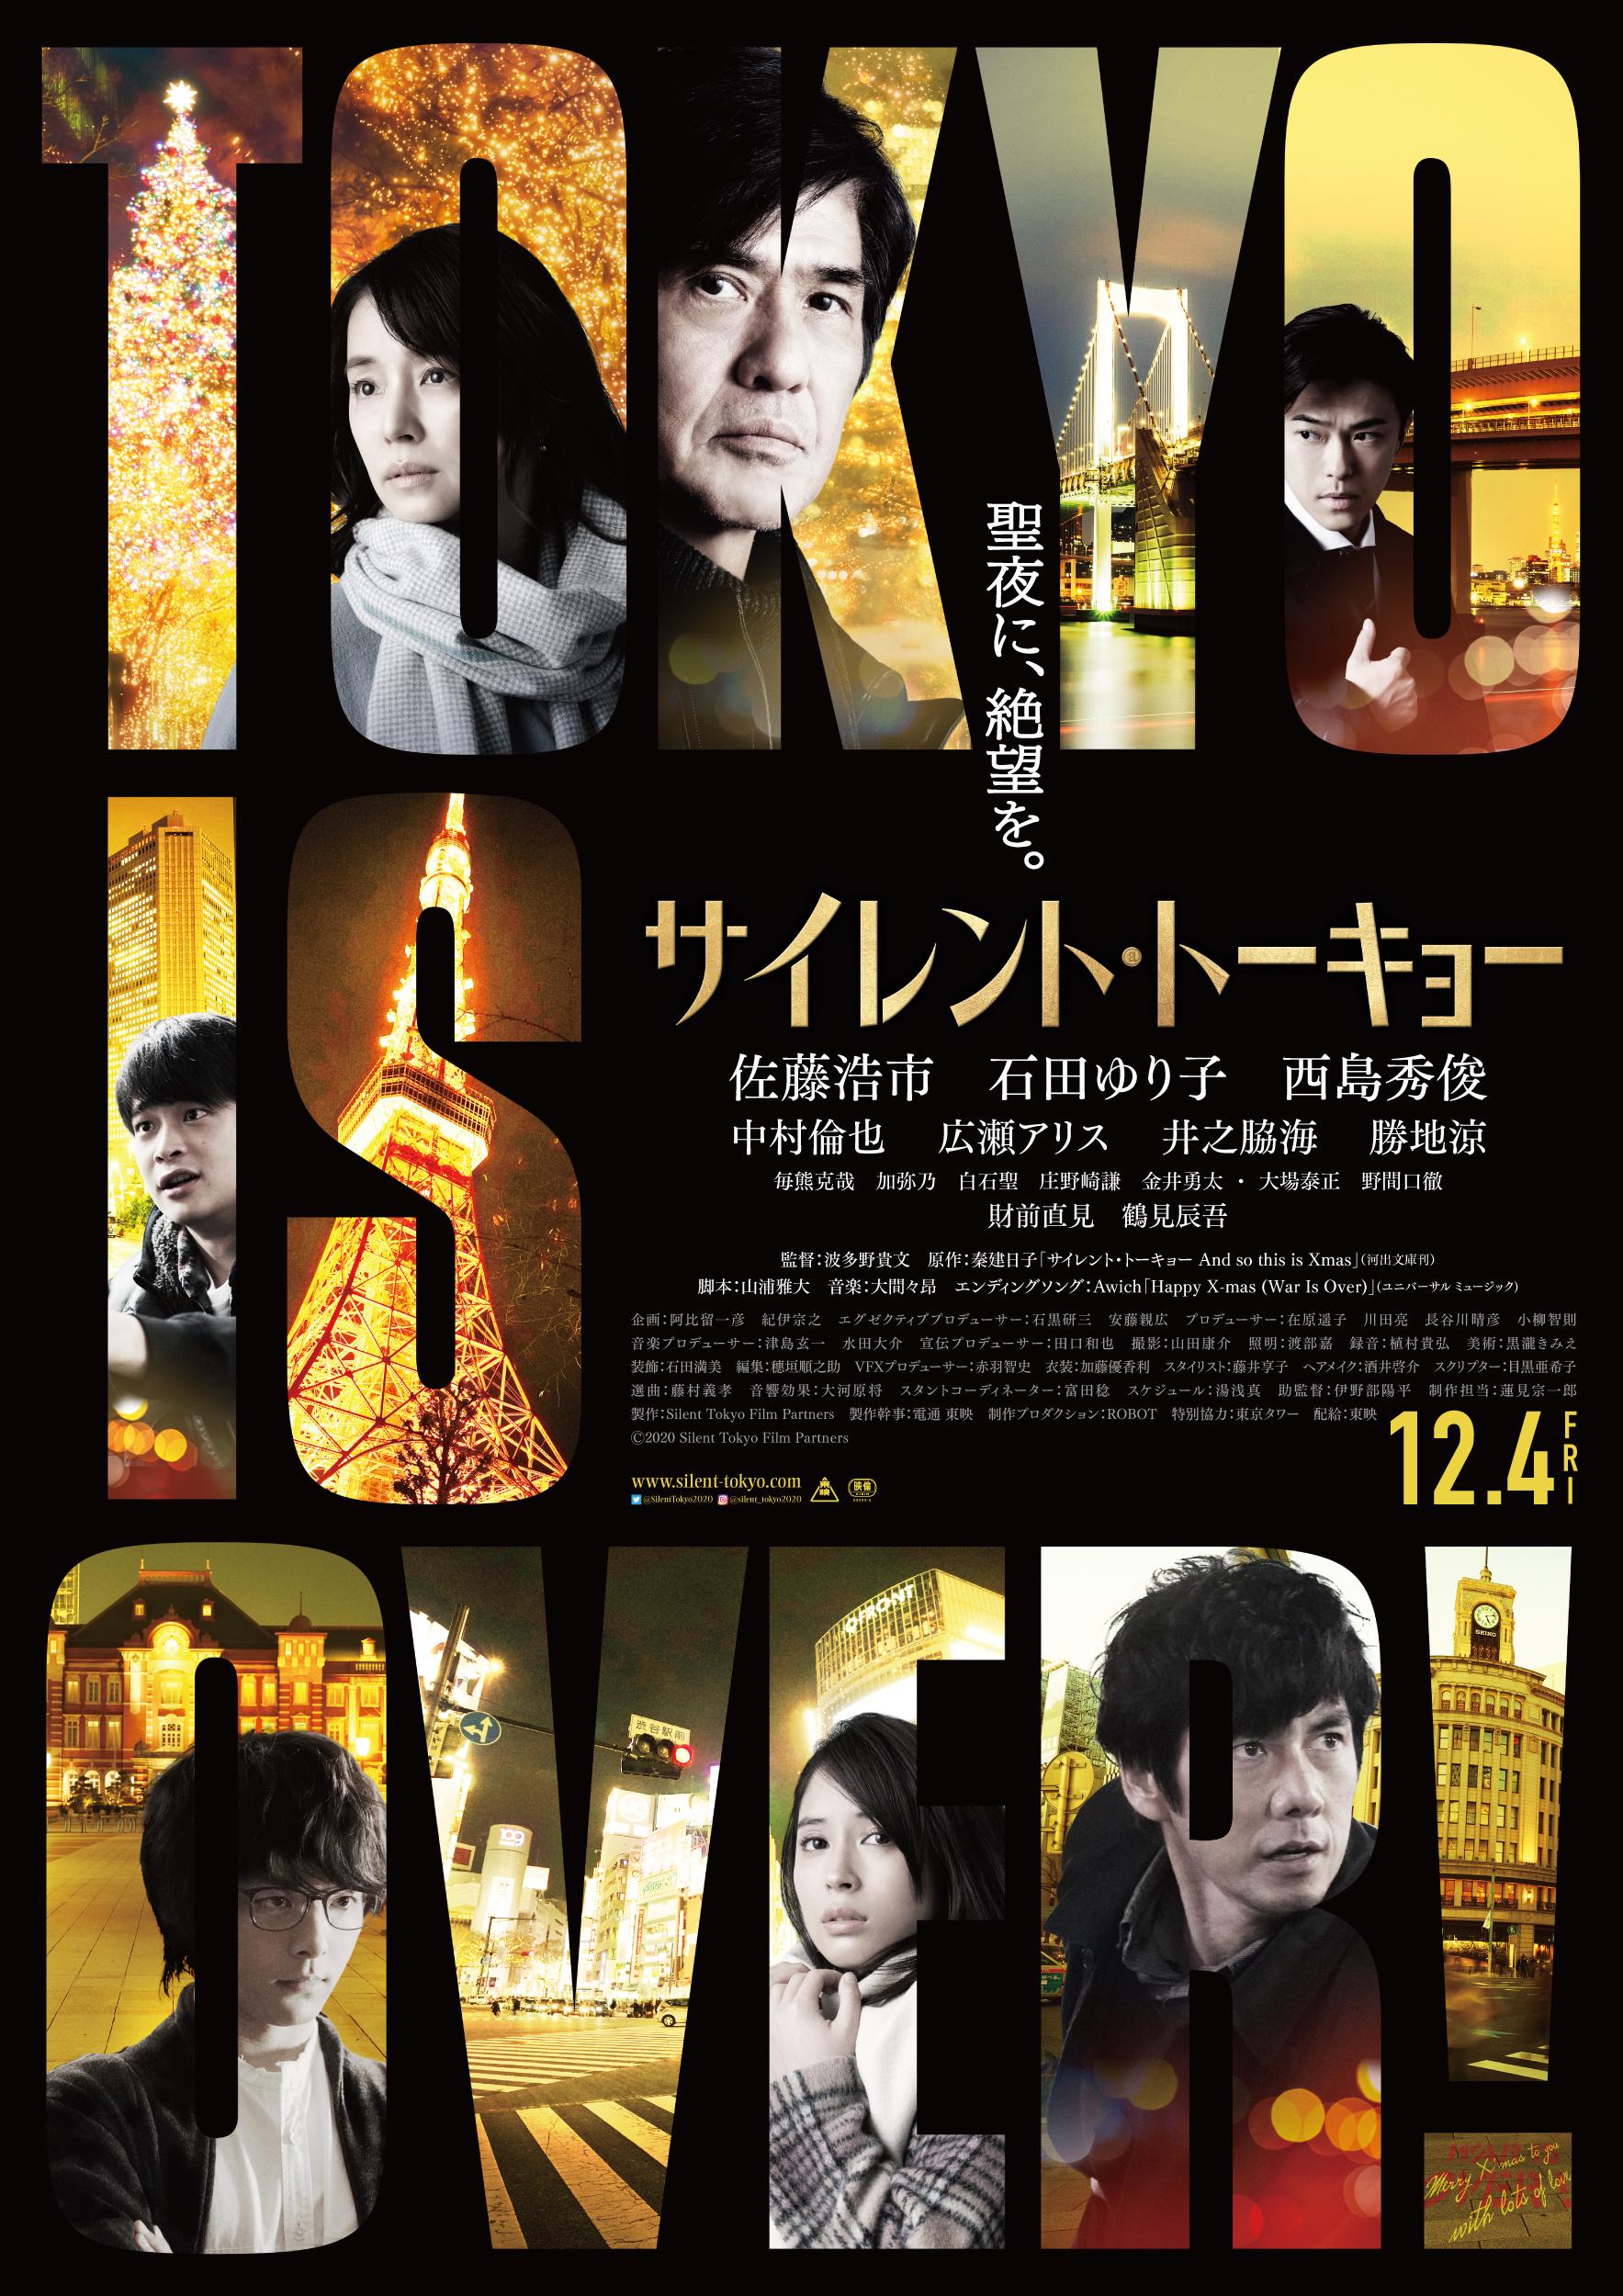 Ⓒ2020 Silent Tokyo Film Partners